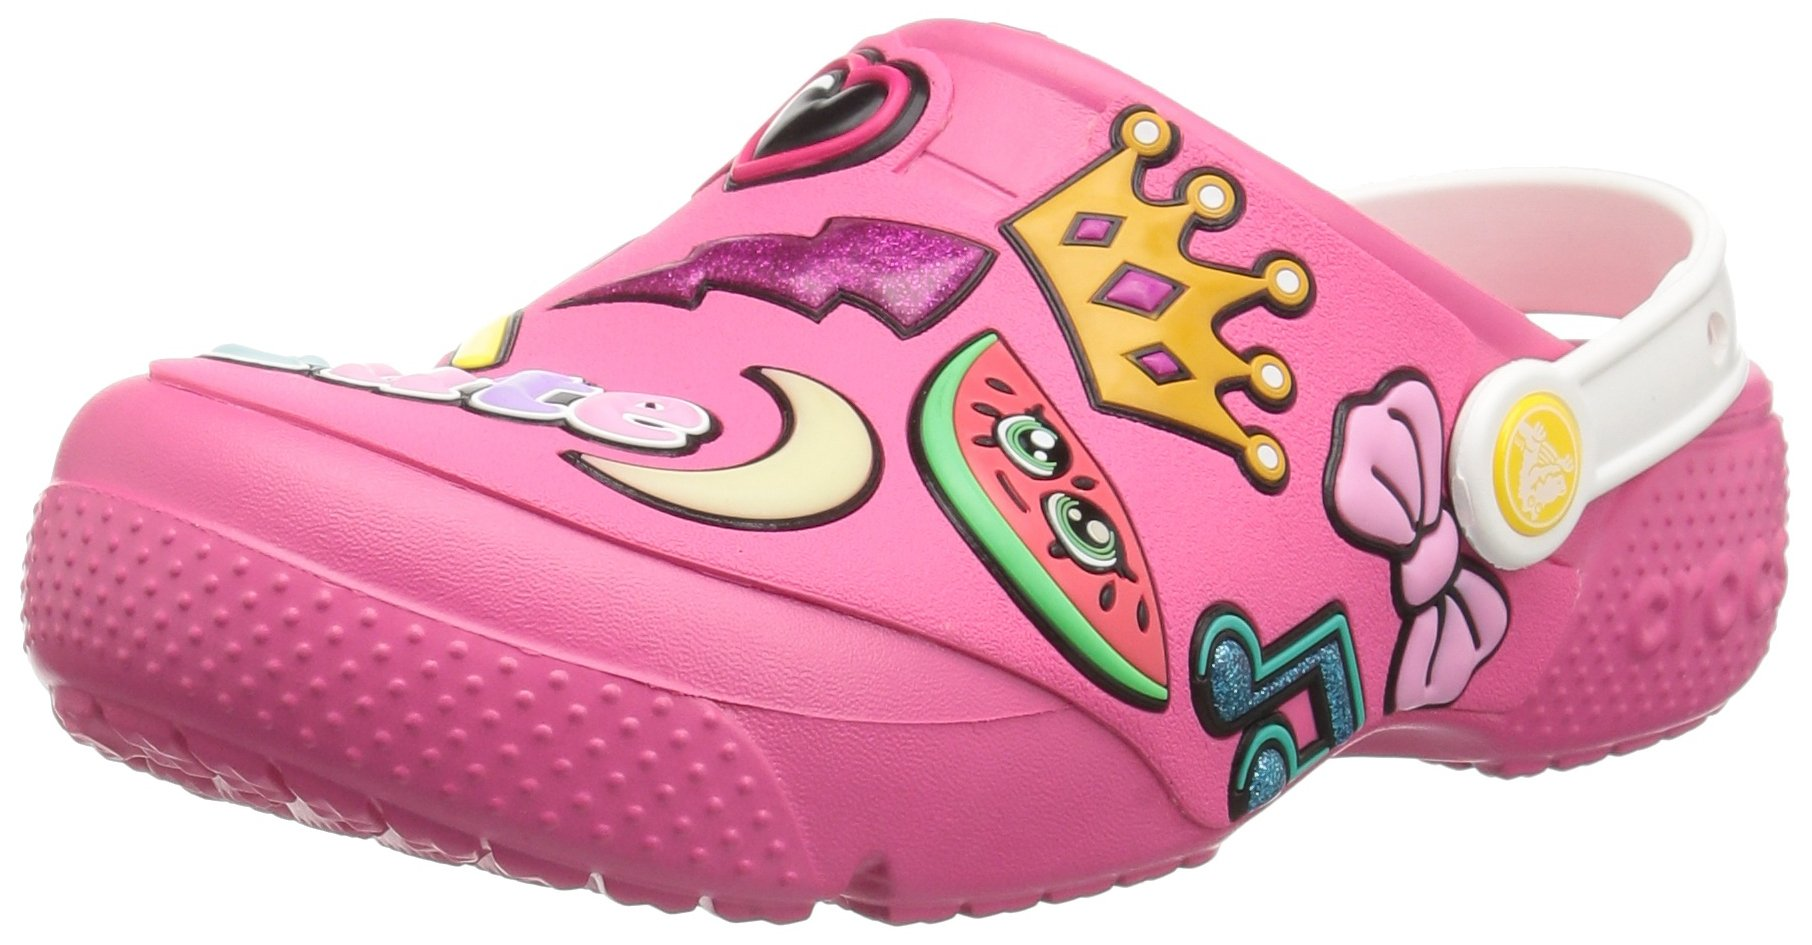 Crocs Unisex FunLab Playful Patches Clog, Paradise Pink, 1 M US Little Kid